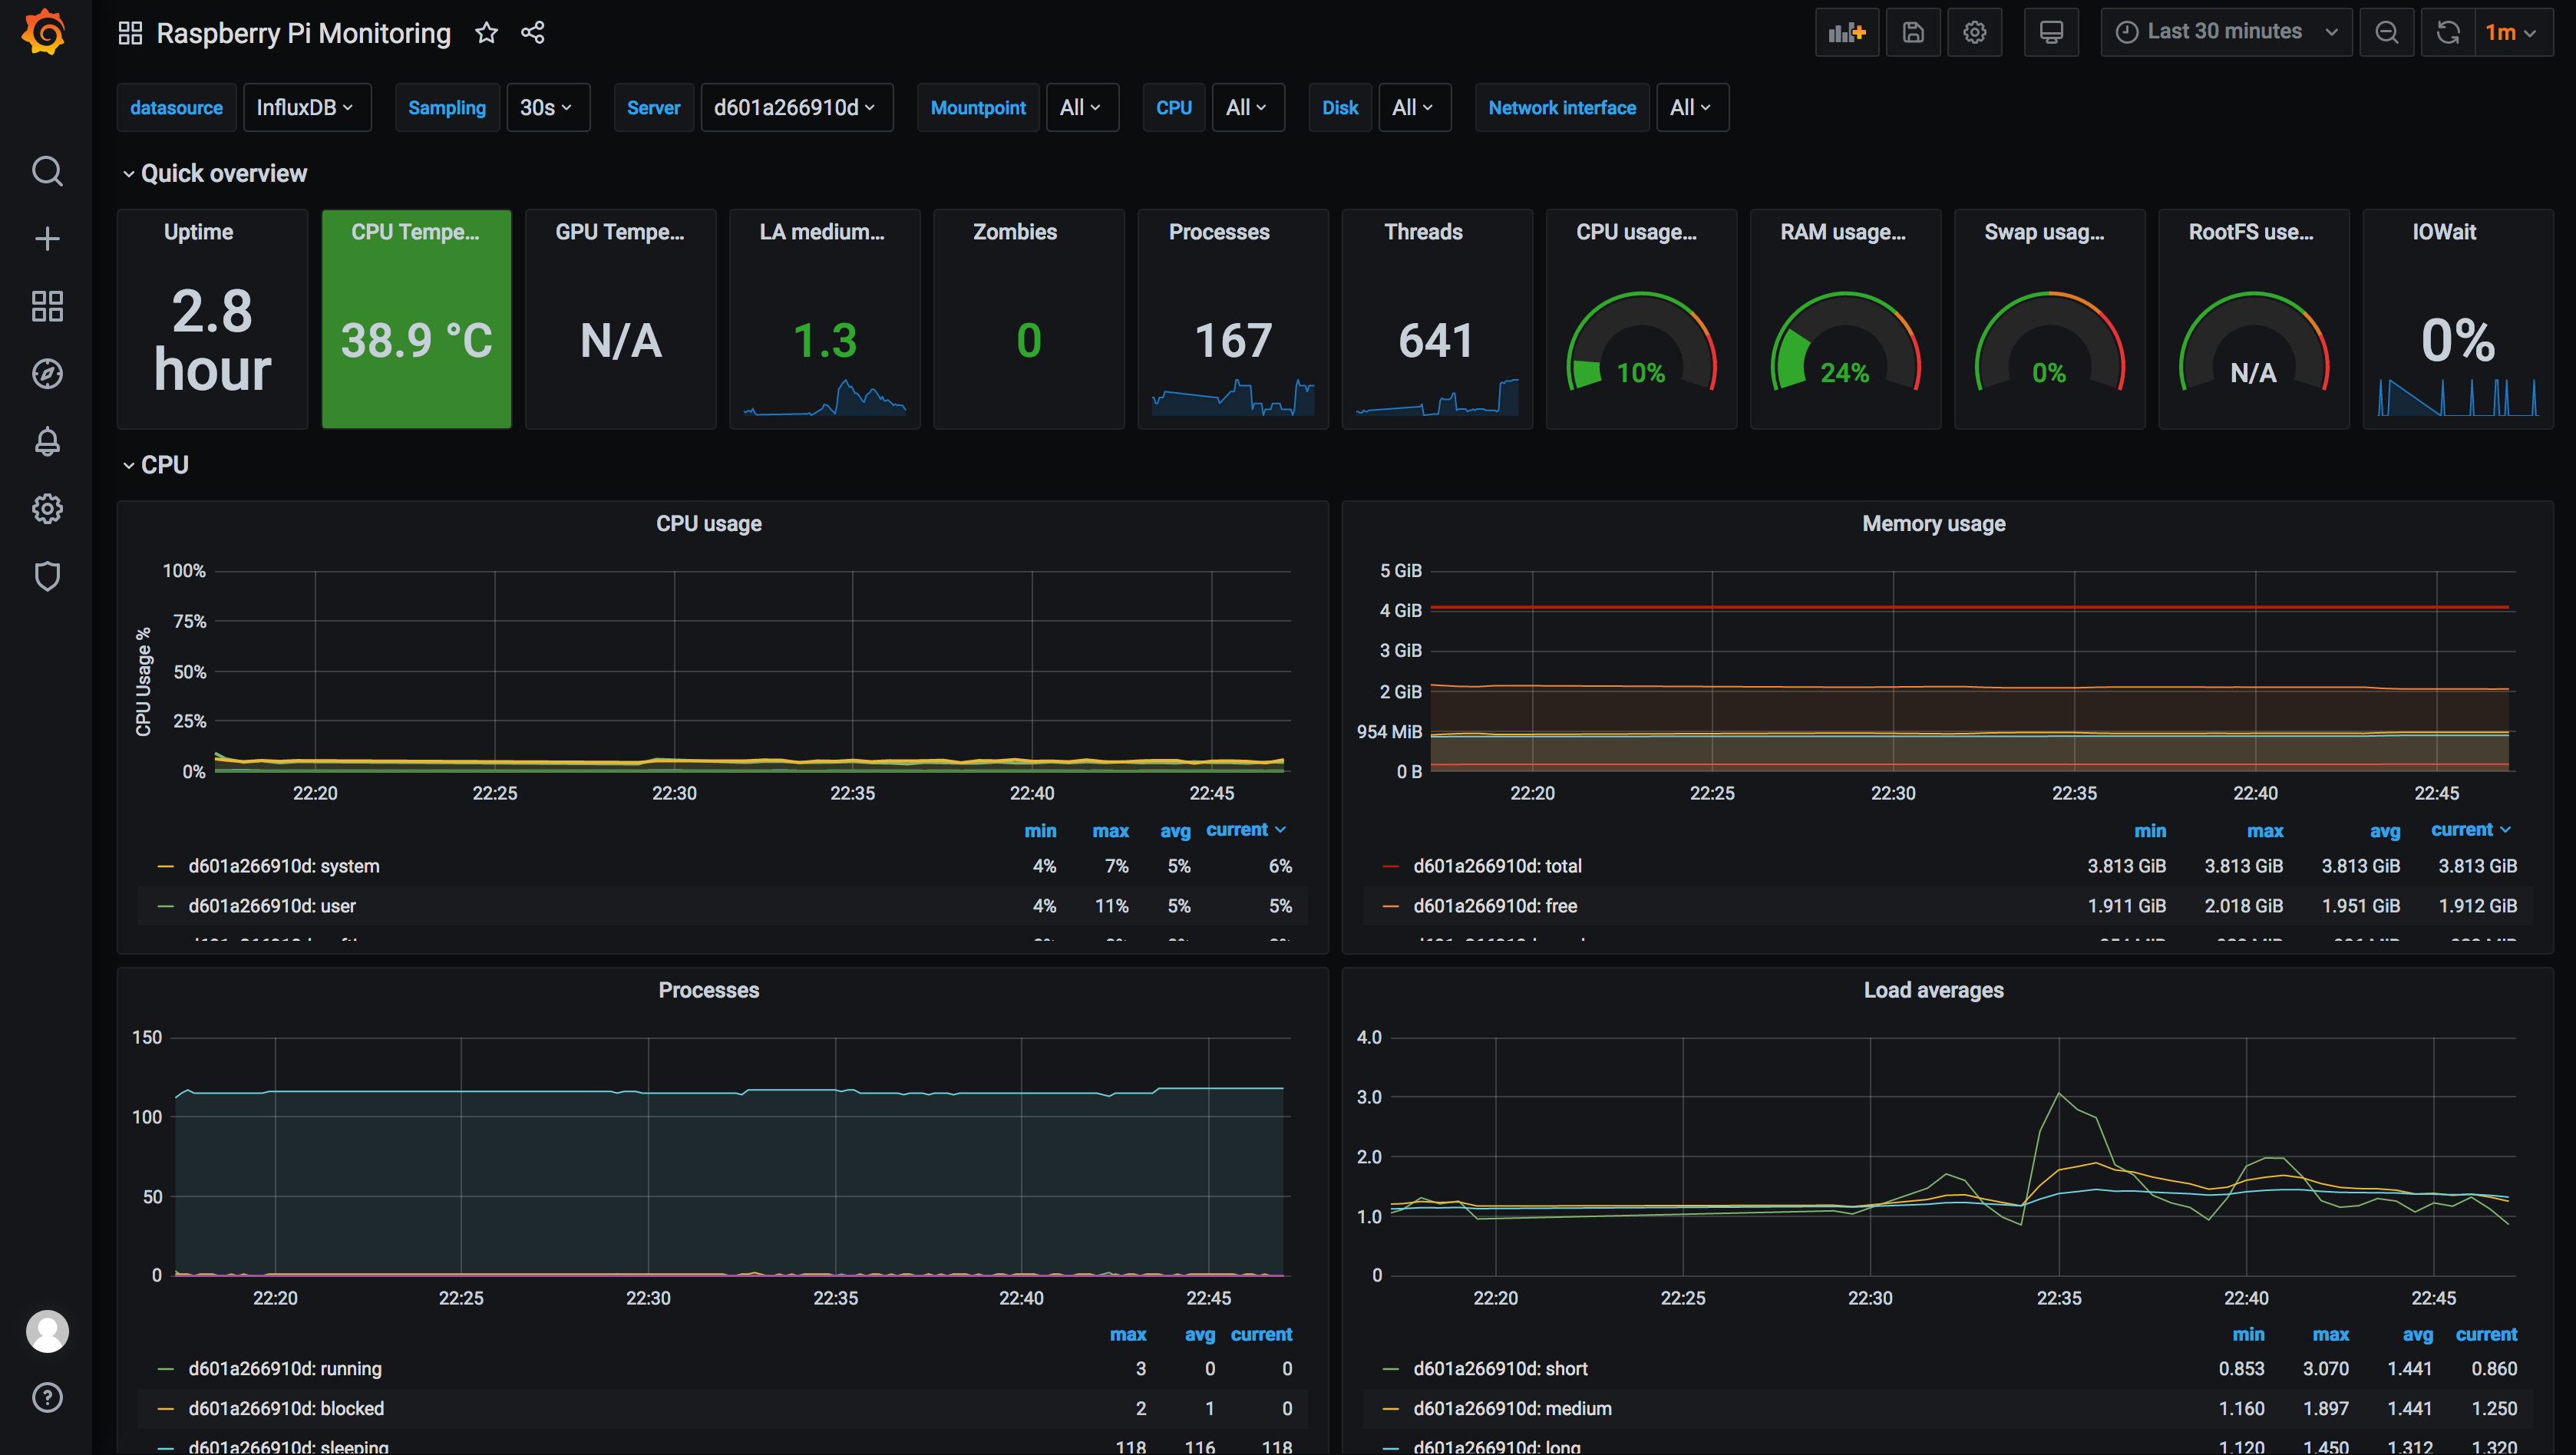 raspberrypi-metrics-grafana-dashboard.png